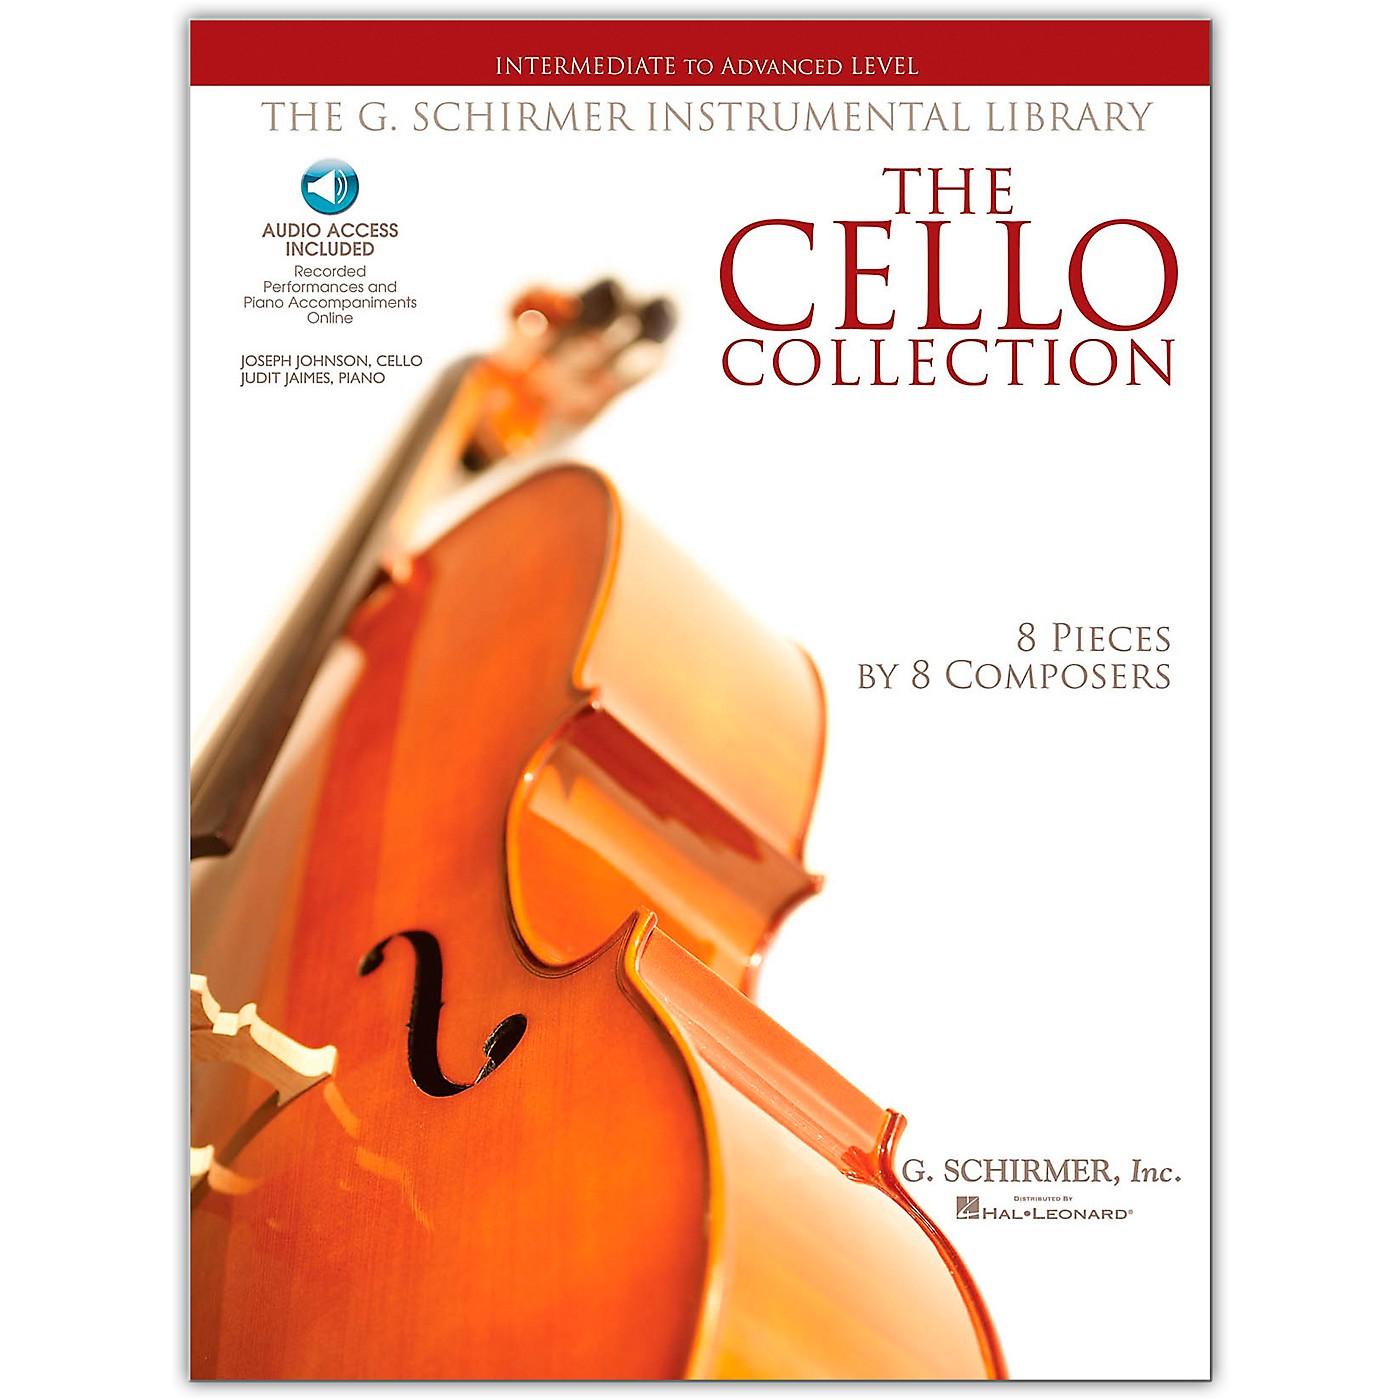 G. Schirmer The Cello Collection - Intermediate To Advanced Cello/Piano G. Schirmer Instr Library Book/Online Audio thumbnail